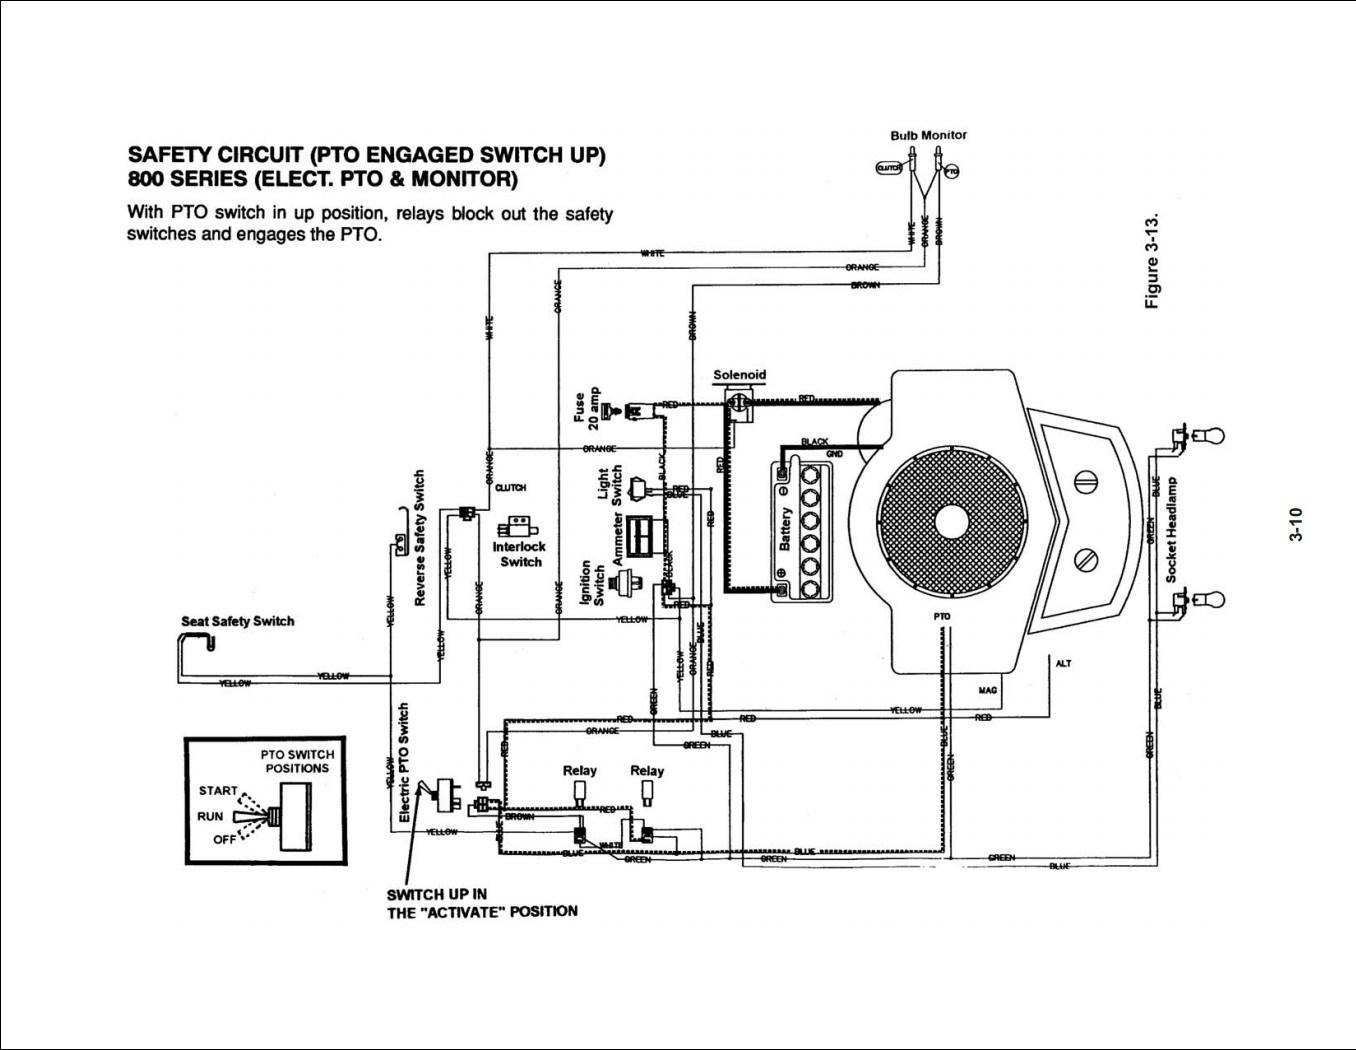 Briggs And Stratton Key Switch Wiring Diagram - Free Wiring Diagram - 6 Pin Switch Wiring Diagram